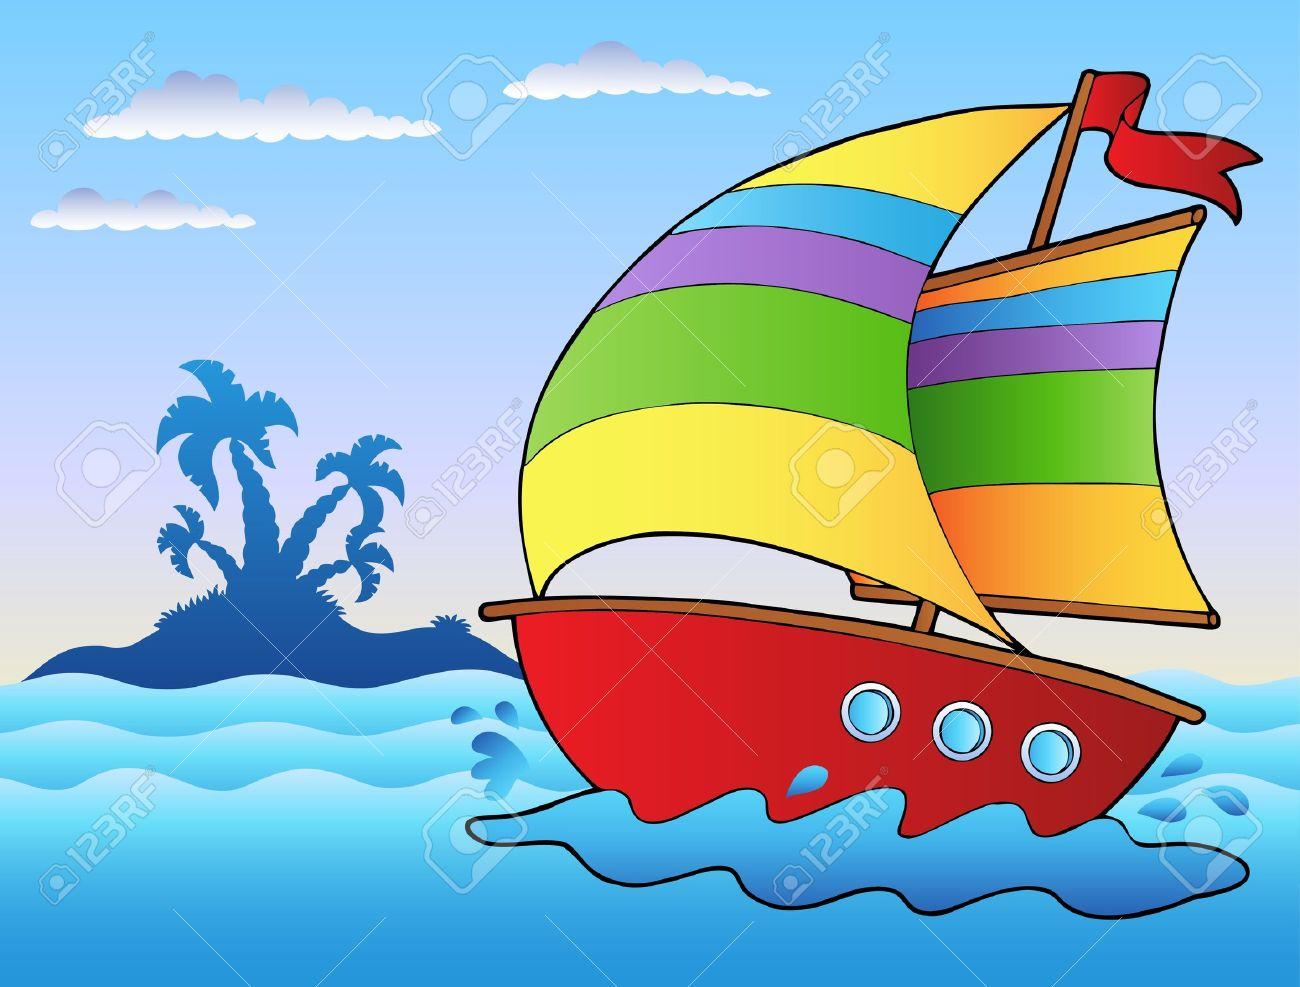 cartoon sailboat near small island royalty free cliparts vectors rh 123rf com cartoon 700 sailboat cartoon sailboat images